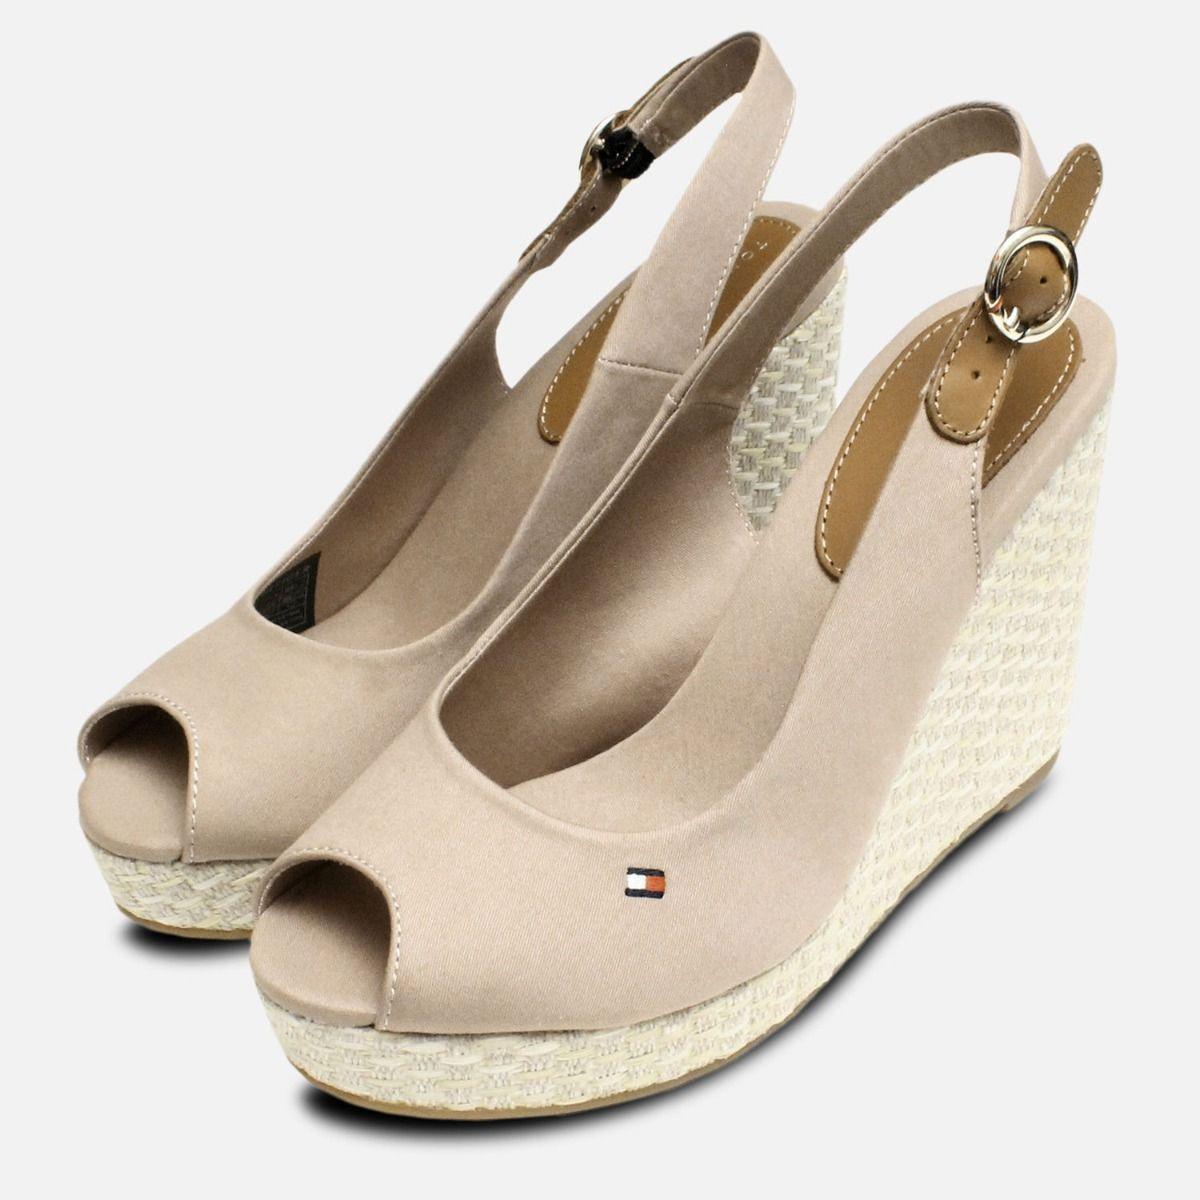 f8b4e7c56048 Tommy Hilfiger Elena Platform Sandals in Cobblestone